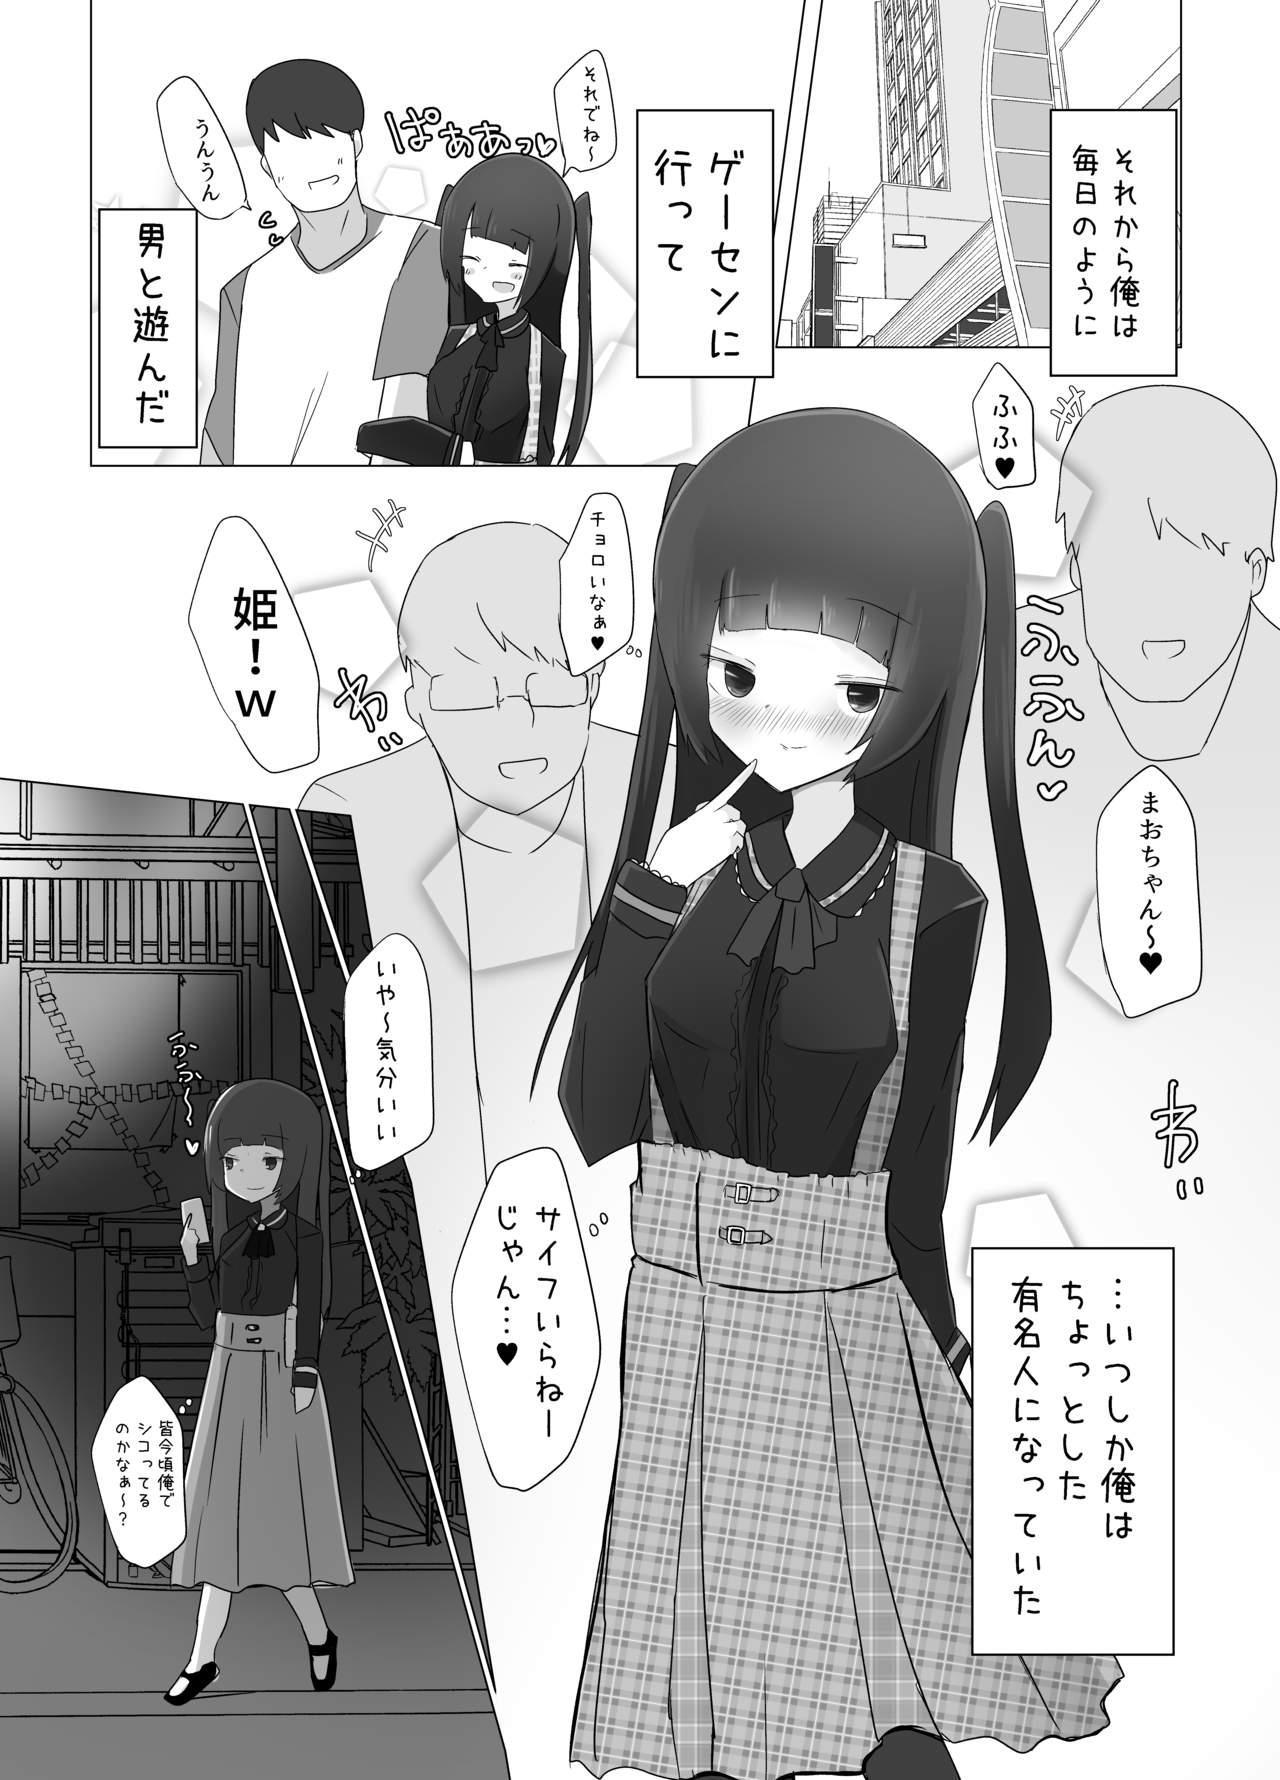 TS Hime wa Okasaretai. 5